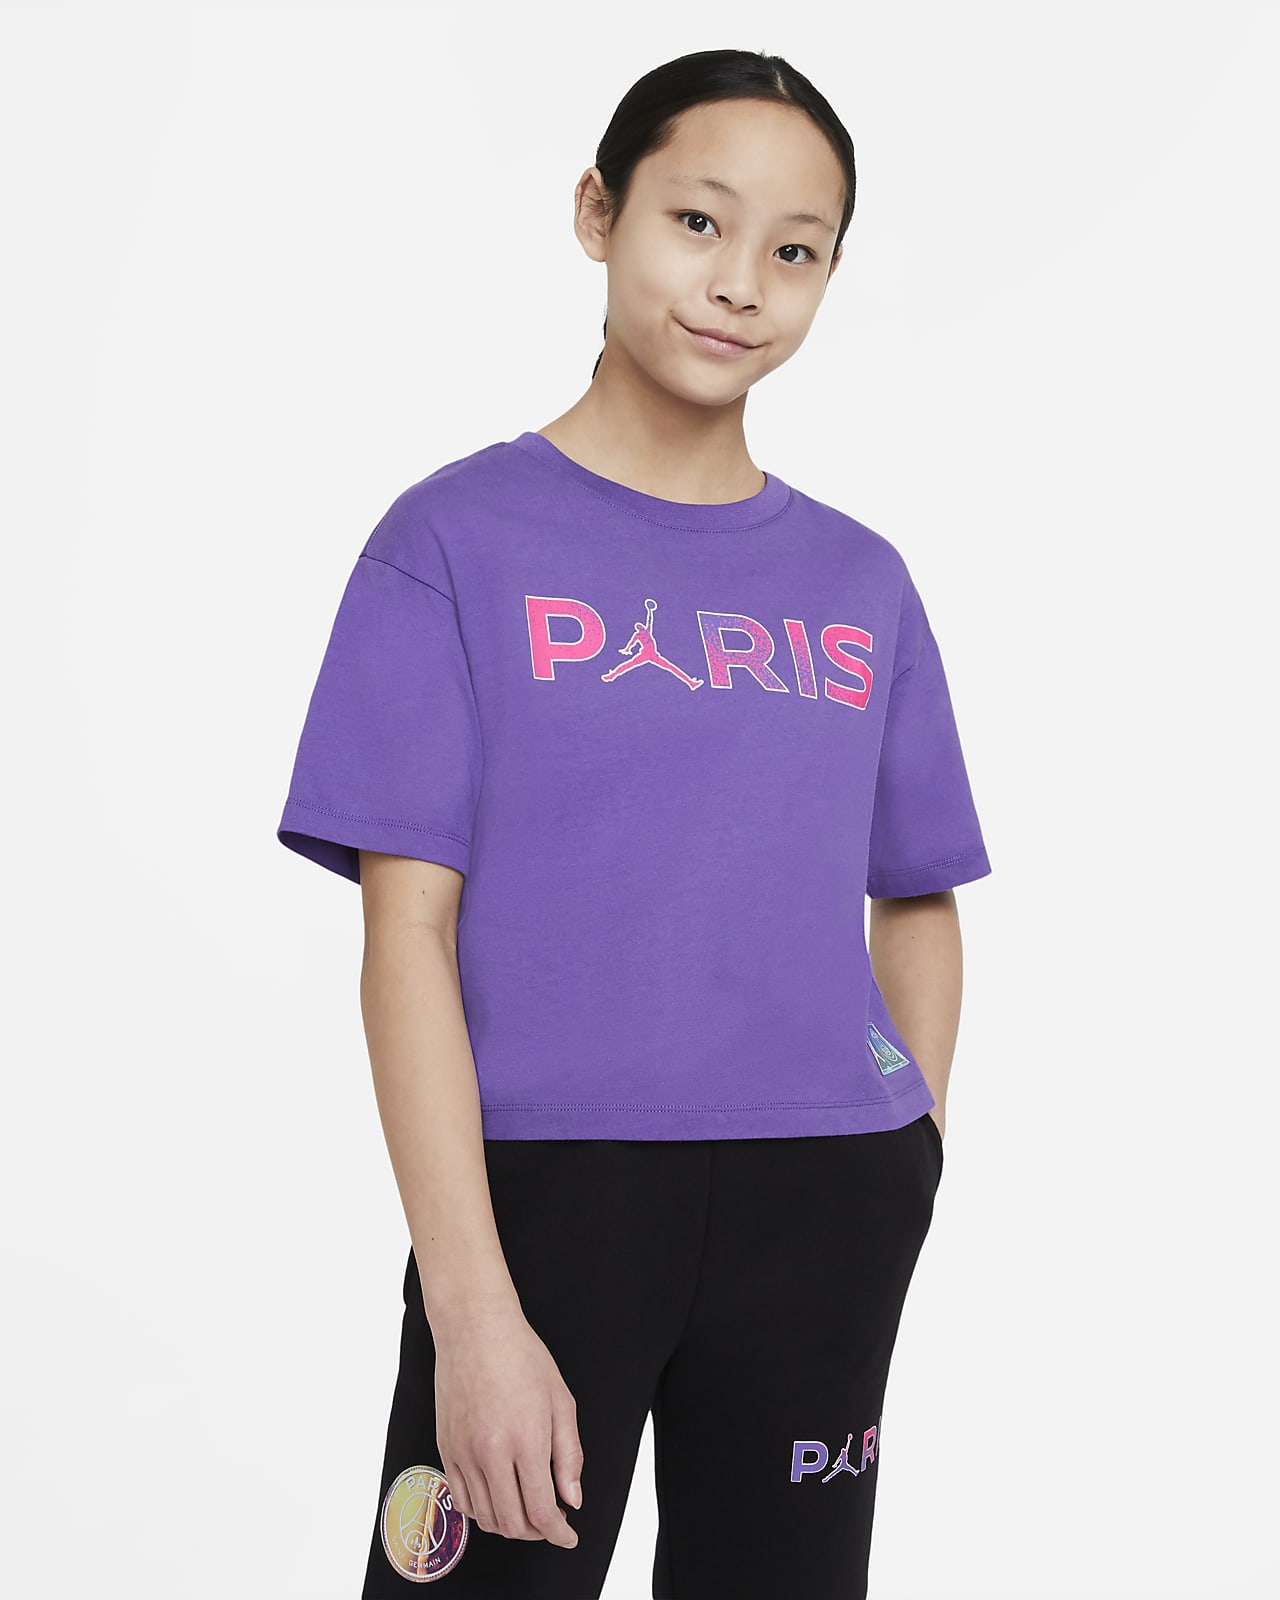 París Saint-Germain Camiseta - Niña